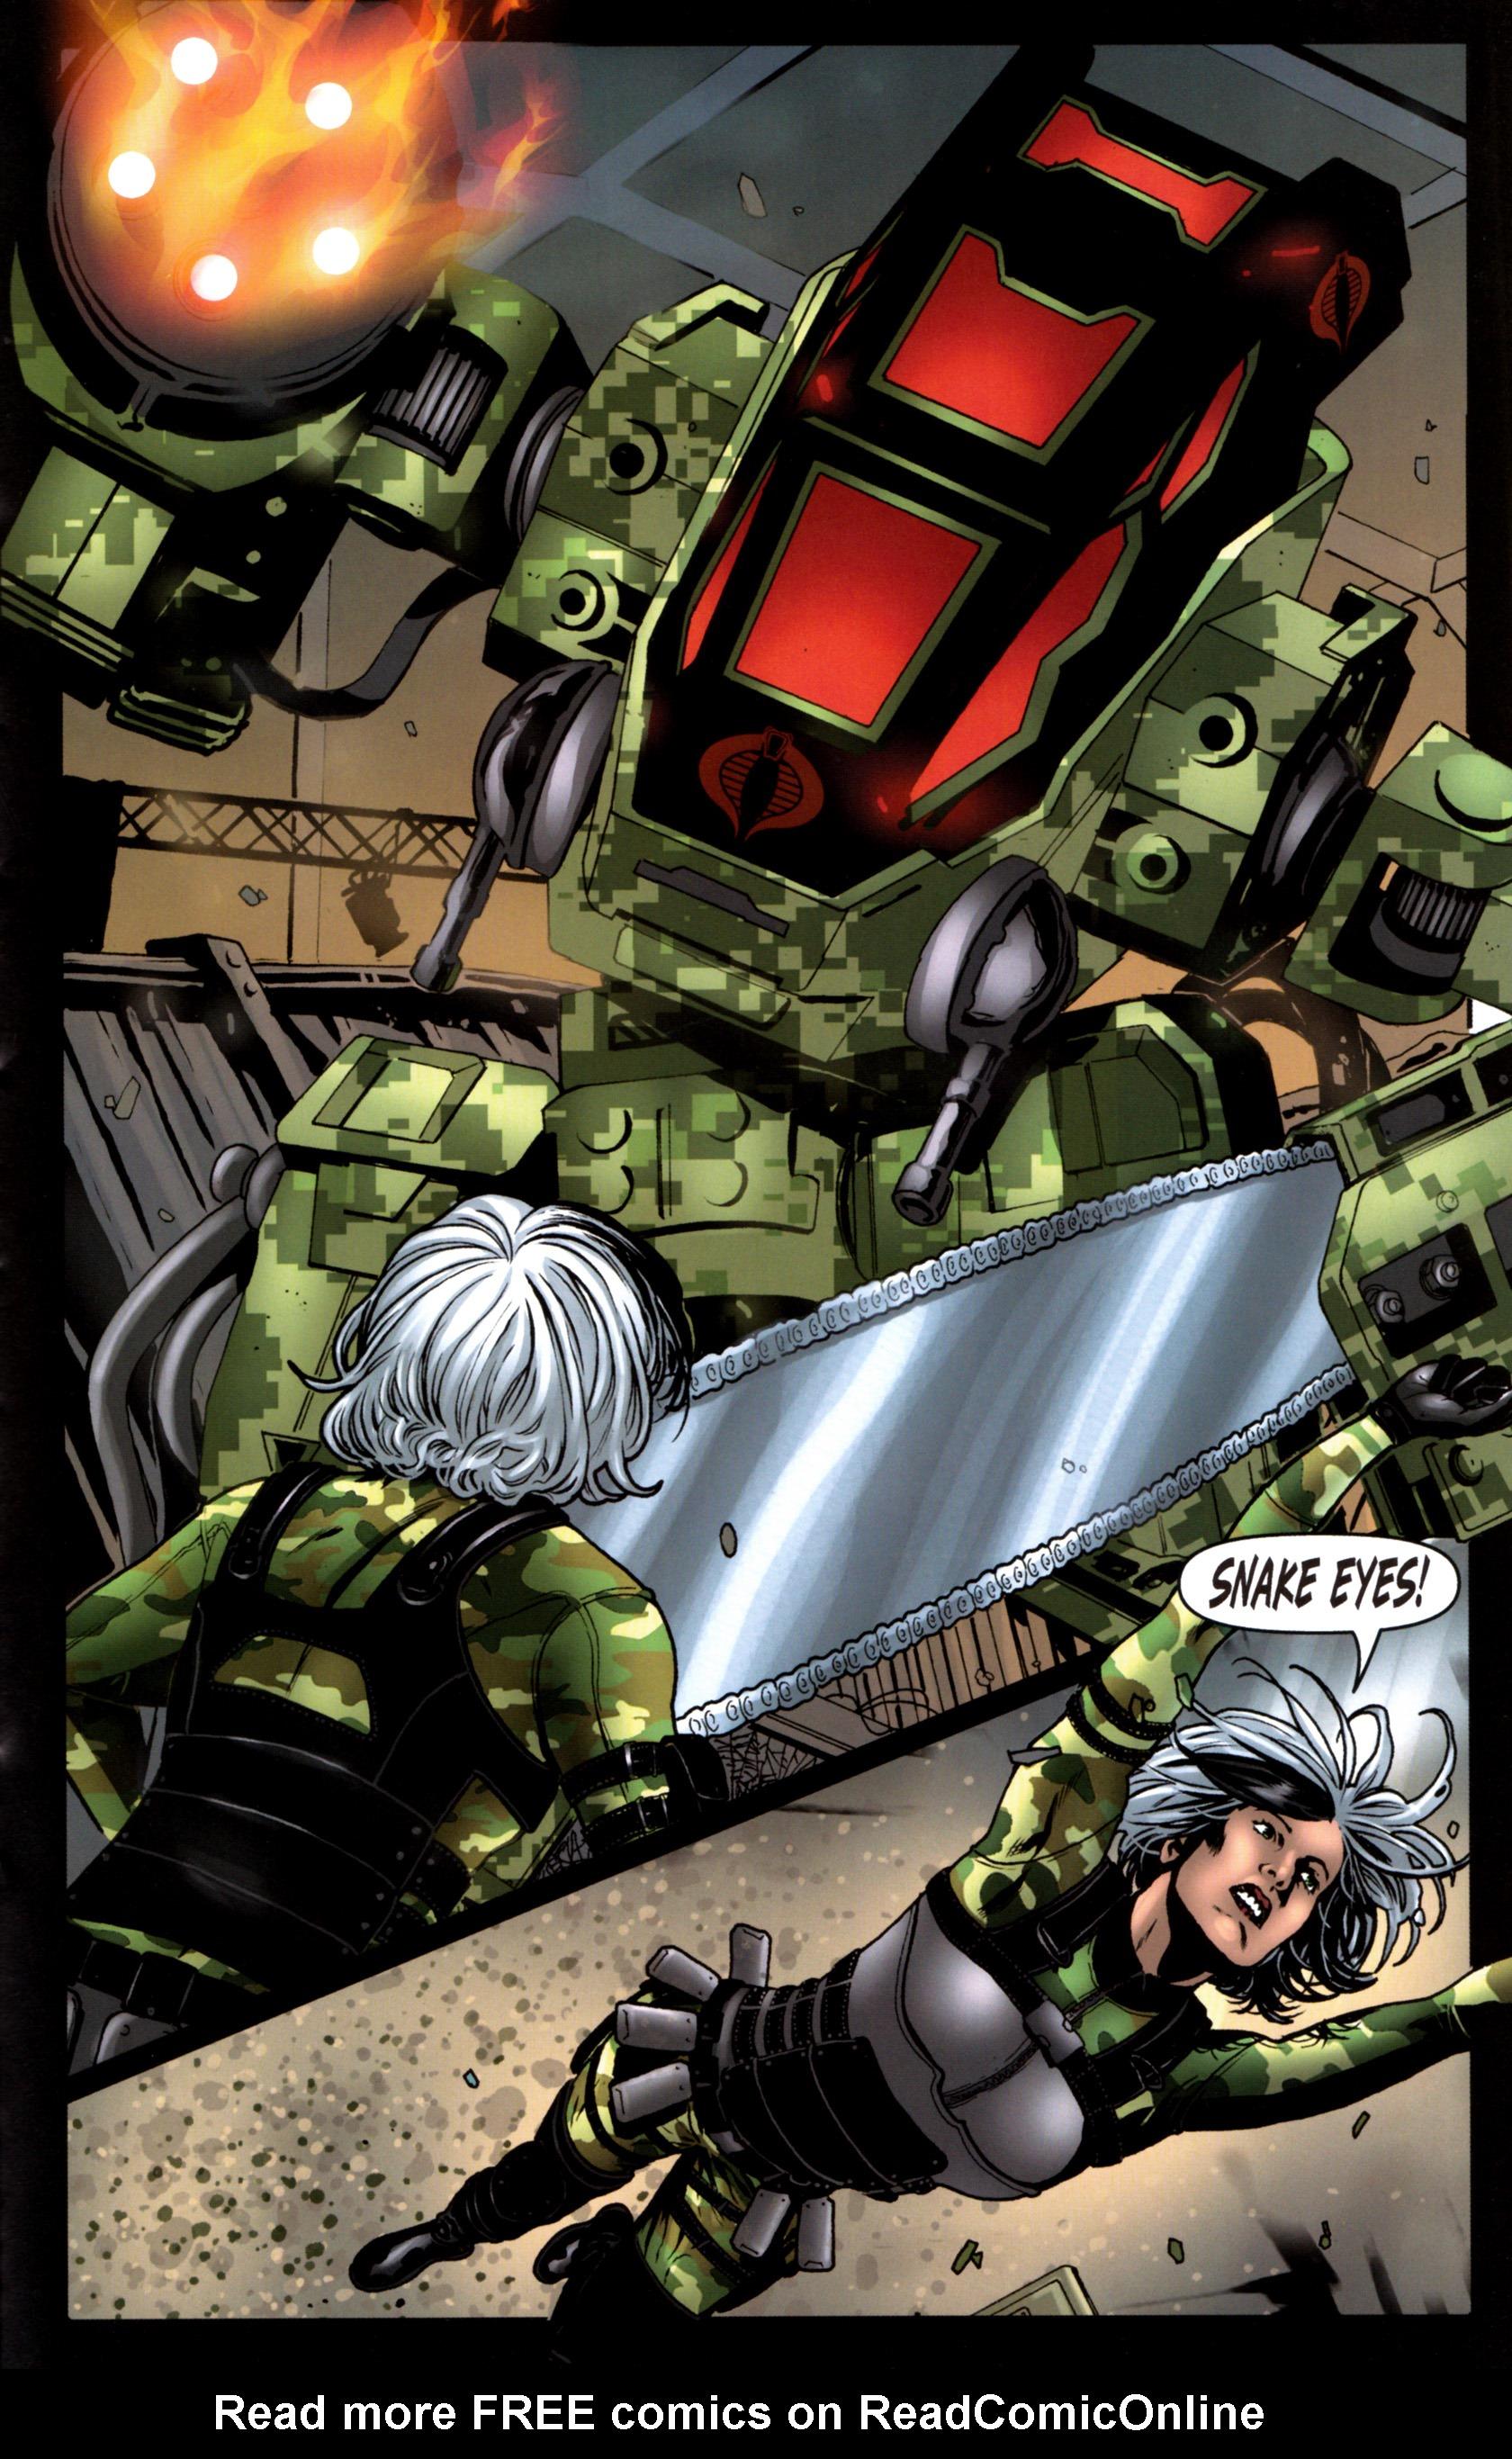 Read online G.I. Joe: Snake Eyes comic -  Issue #9 - 22